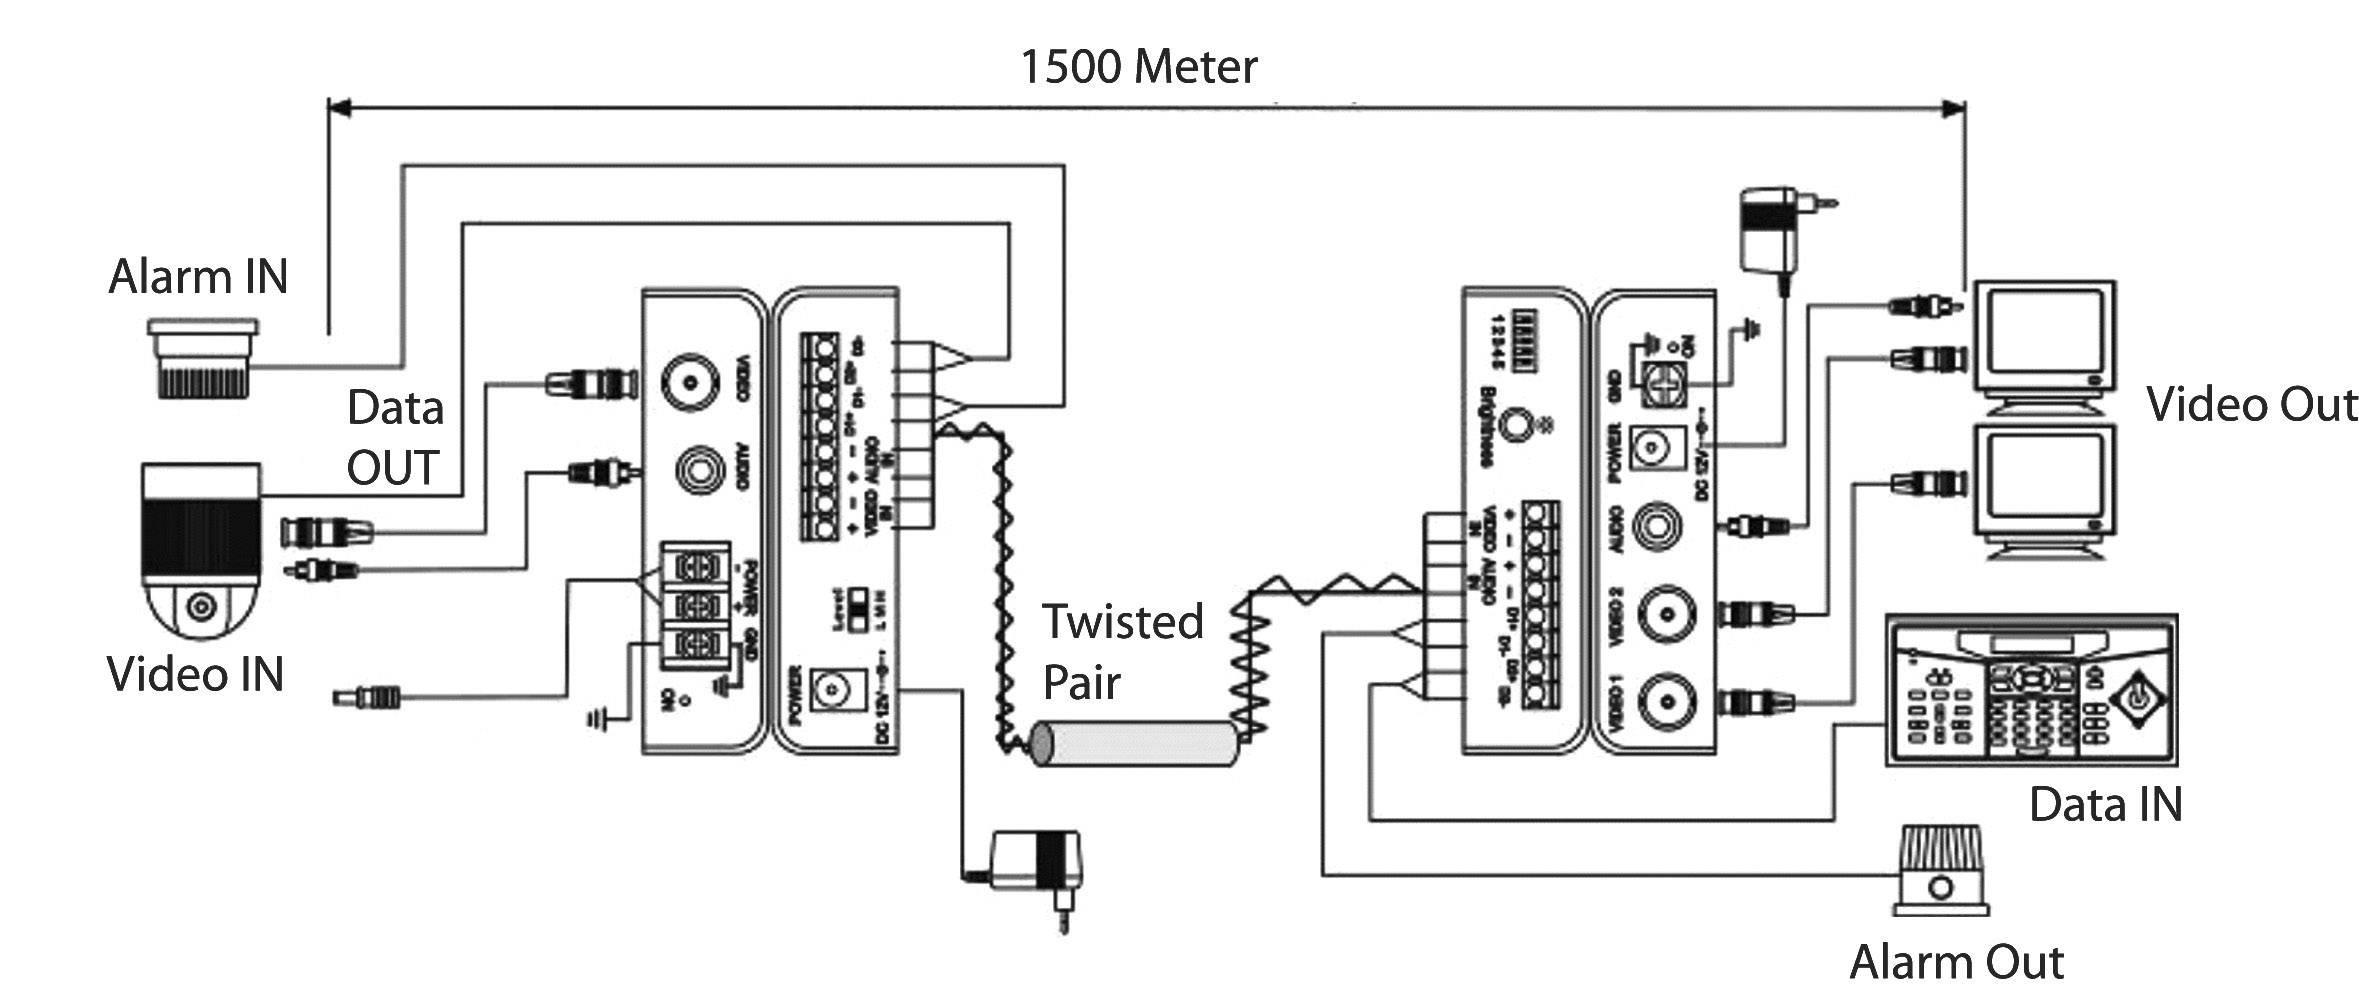 medium resolution of acewell wiring diagram electrical wiring diagrams cycle country wiring diagram abus wiring diagram cable build electrical